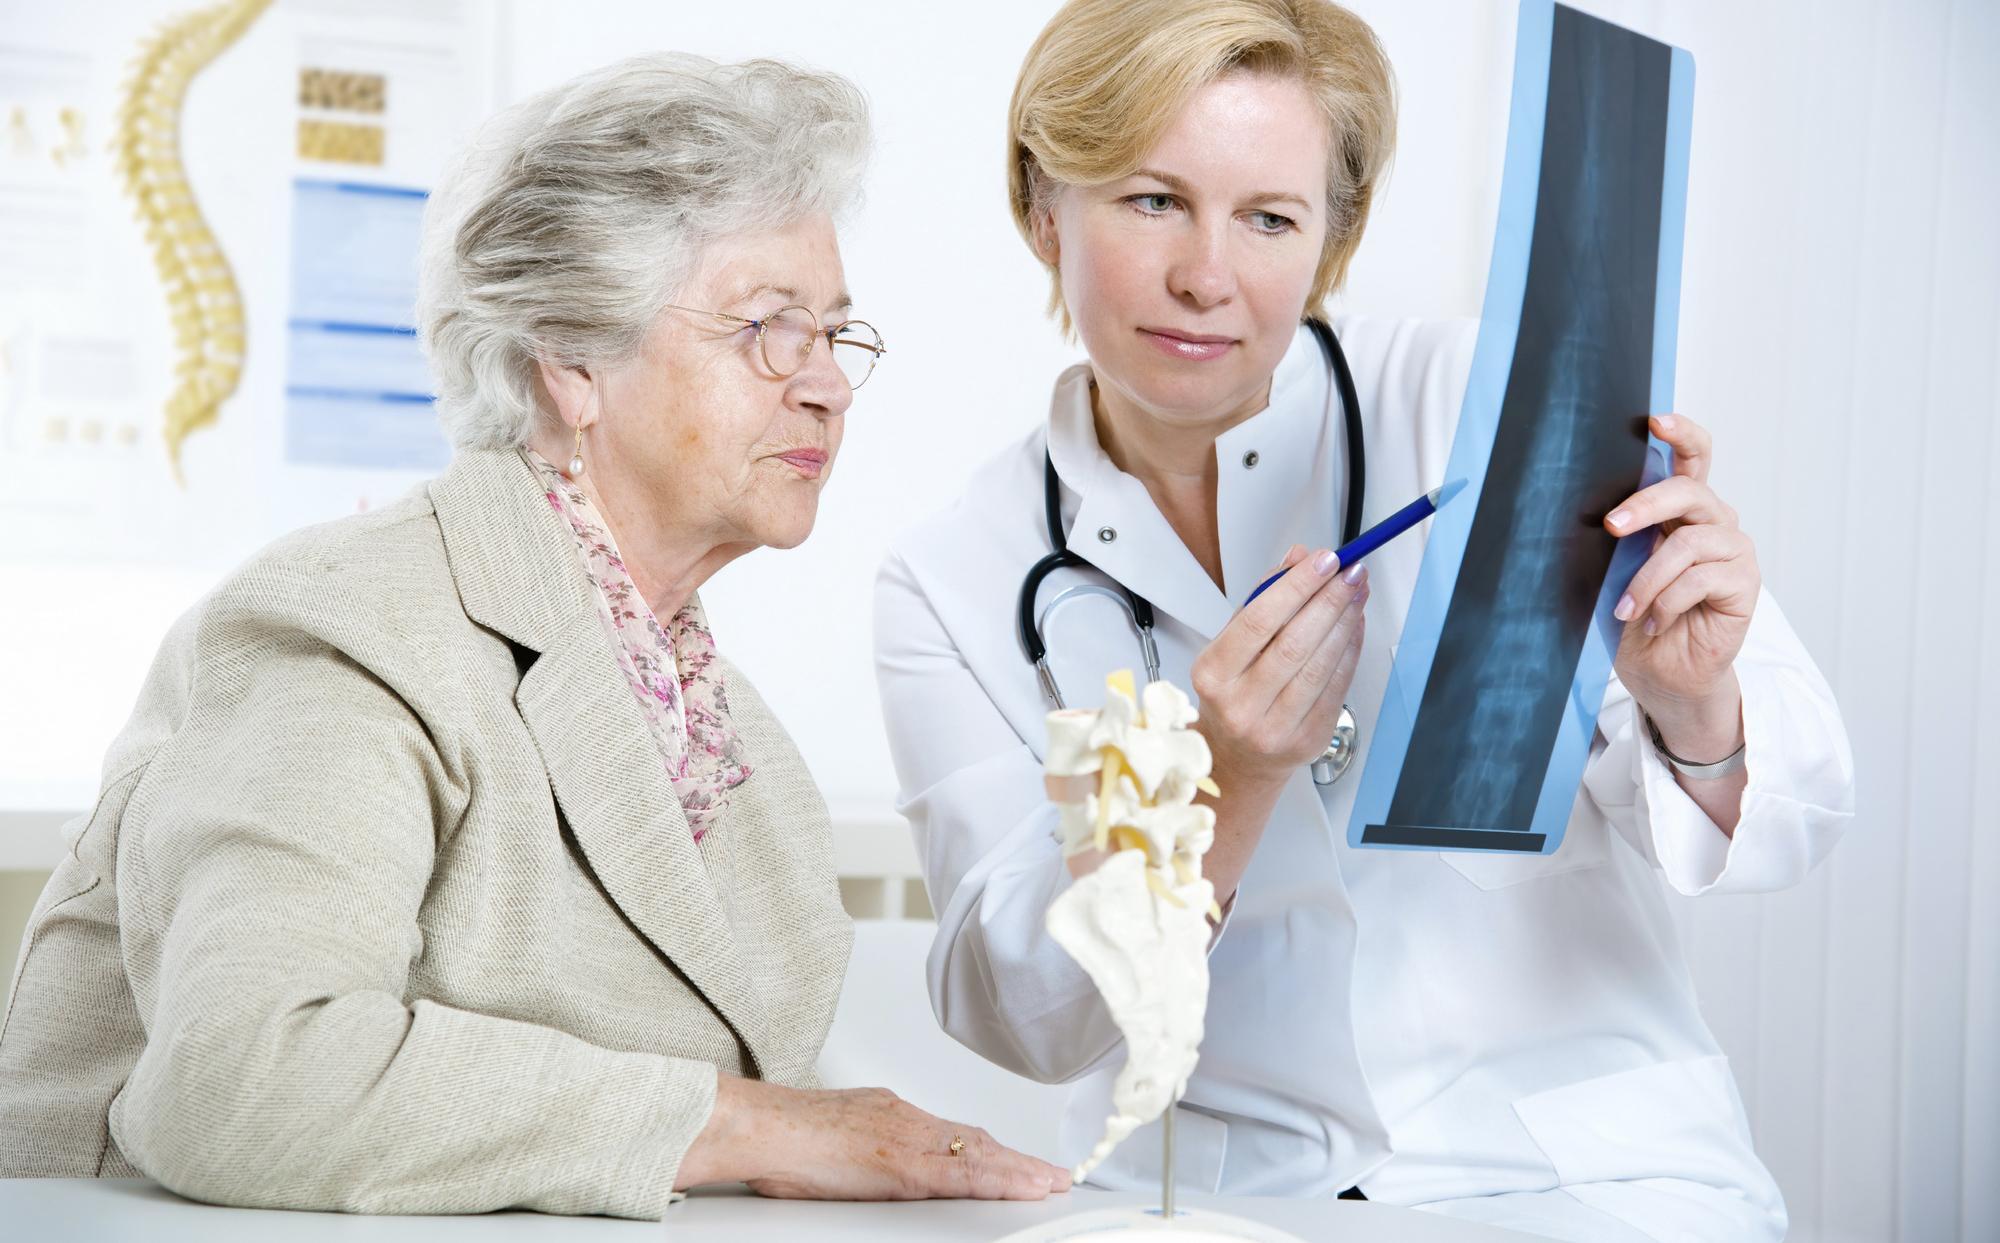 консультация врача-специалиста